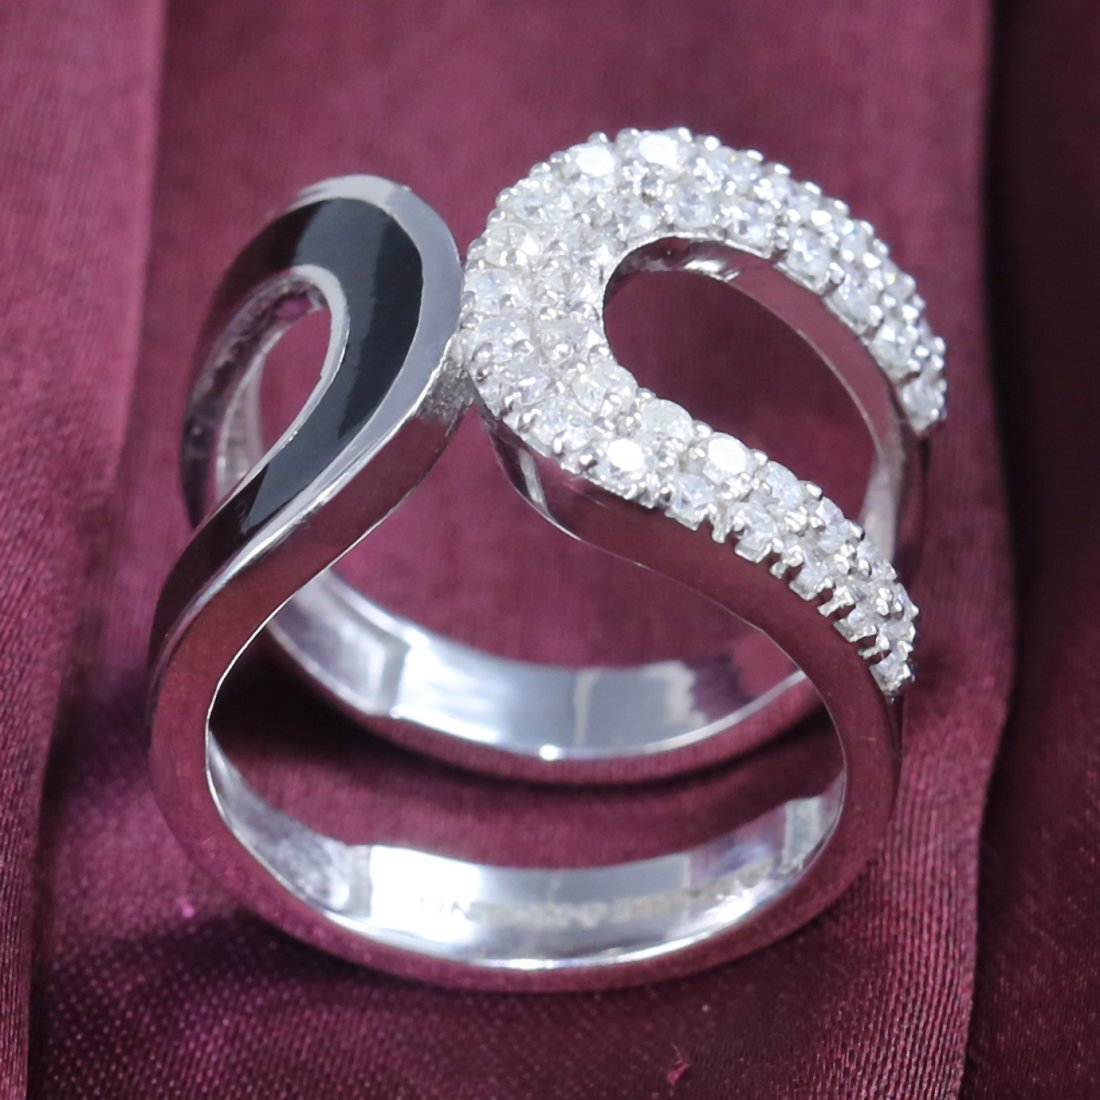 14 K White Gold Diamond Ring with Black enamel work